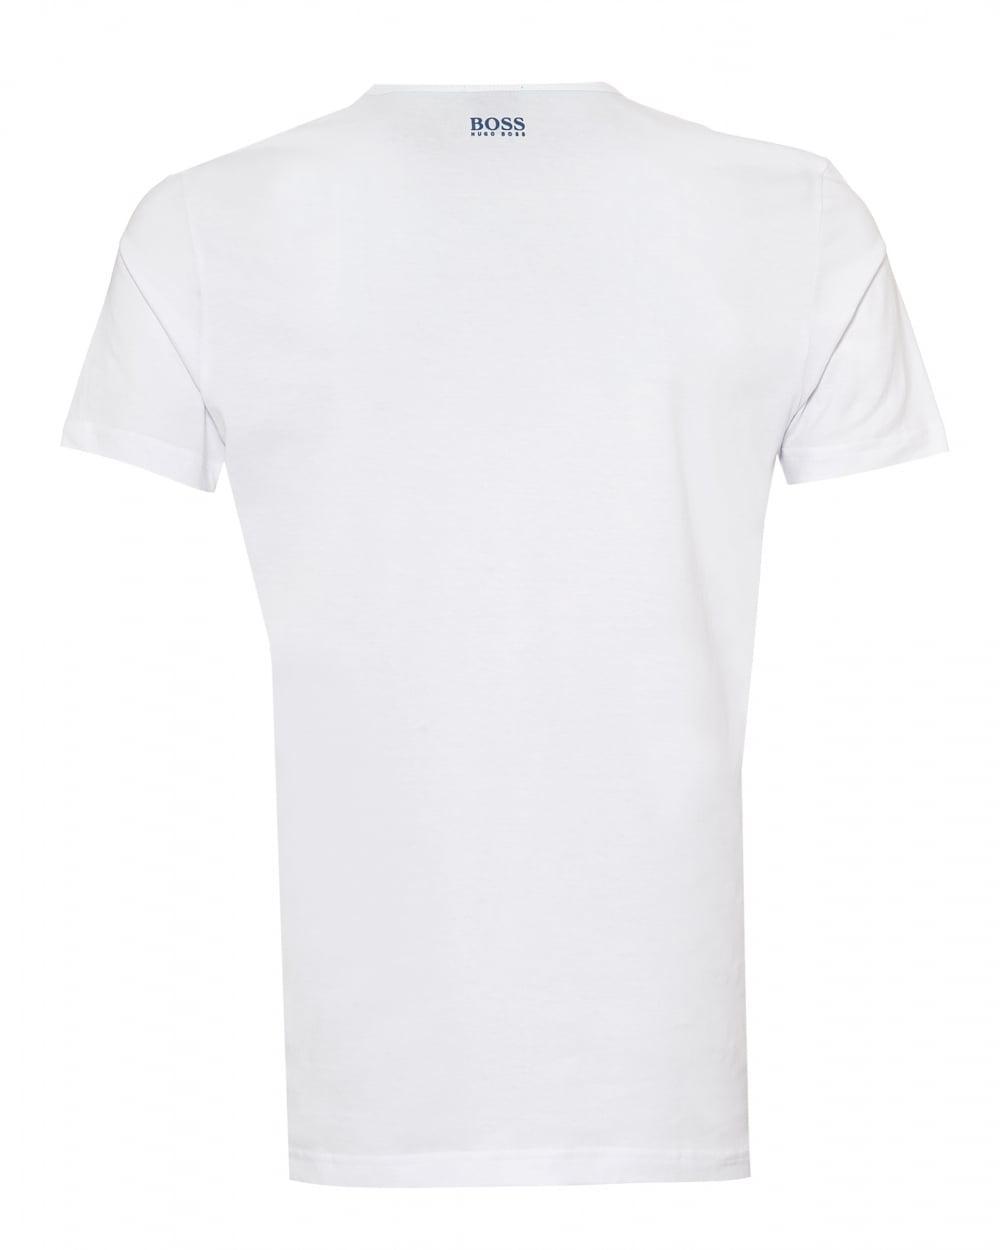 79ff8583 Lyst - BOSS Tee 2 T-shirt, 3d Logo Graphic White Tee in White for Men